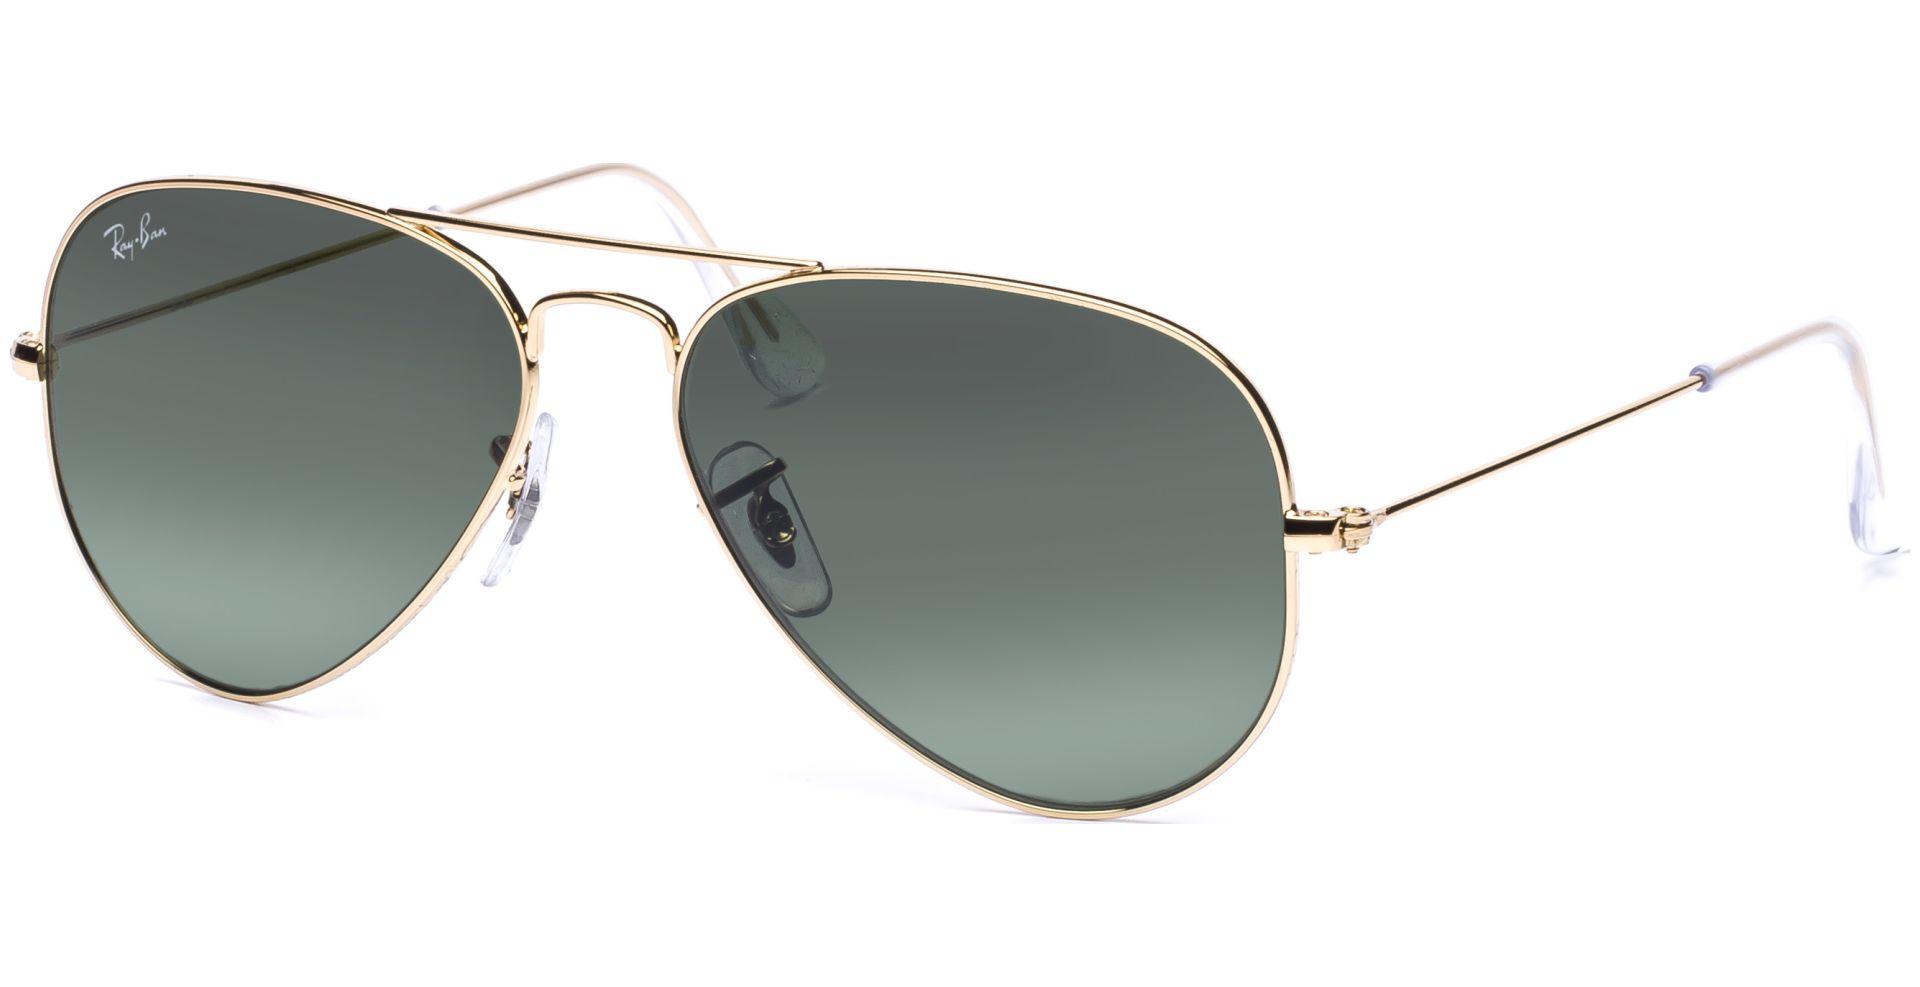 ray ban 3025 aviator arista w3234 sonnenbrille